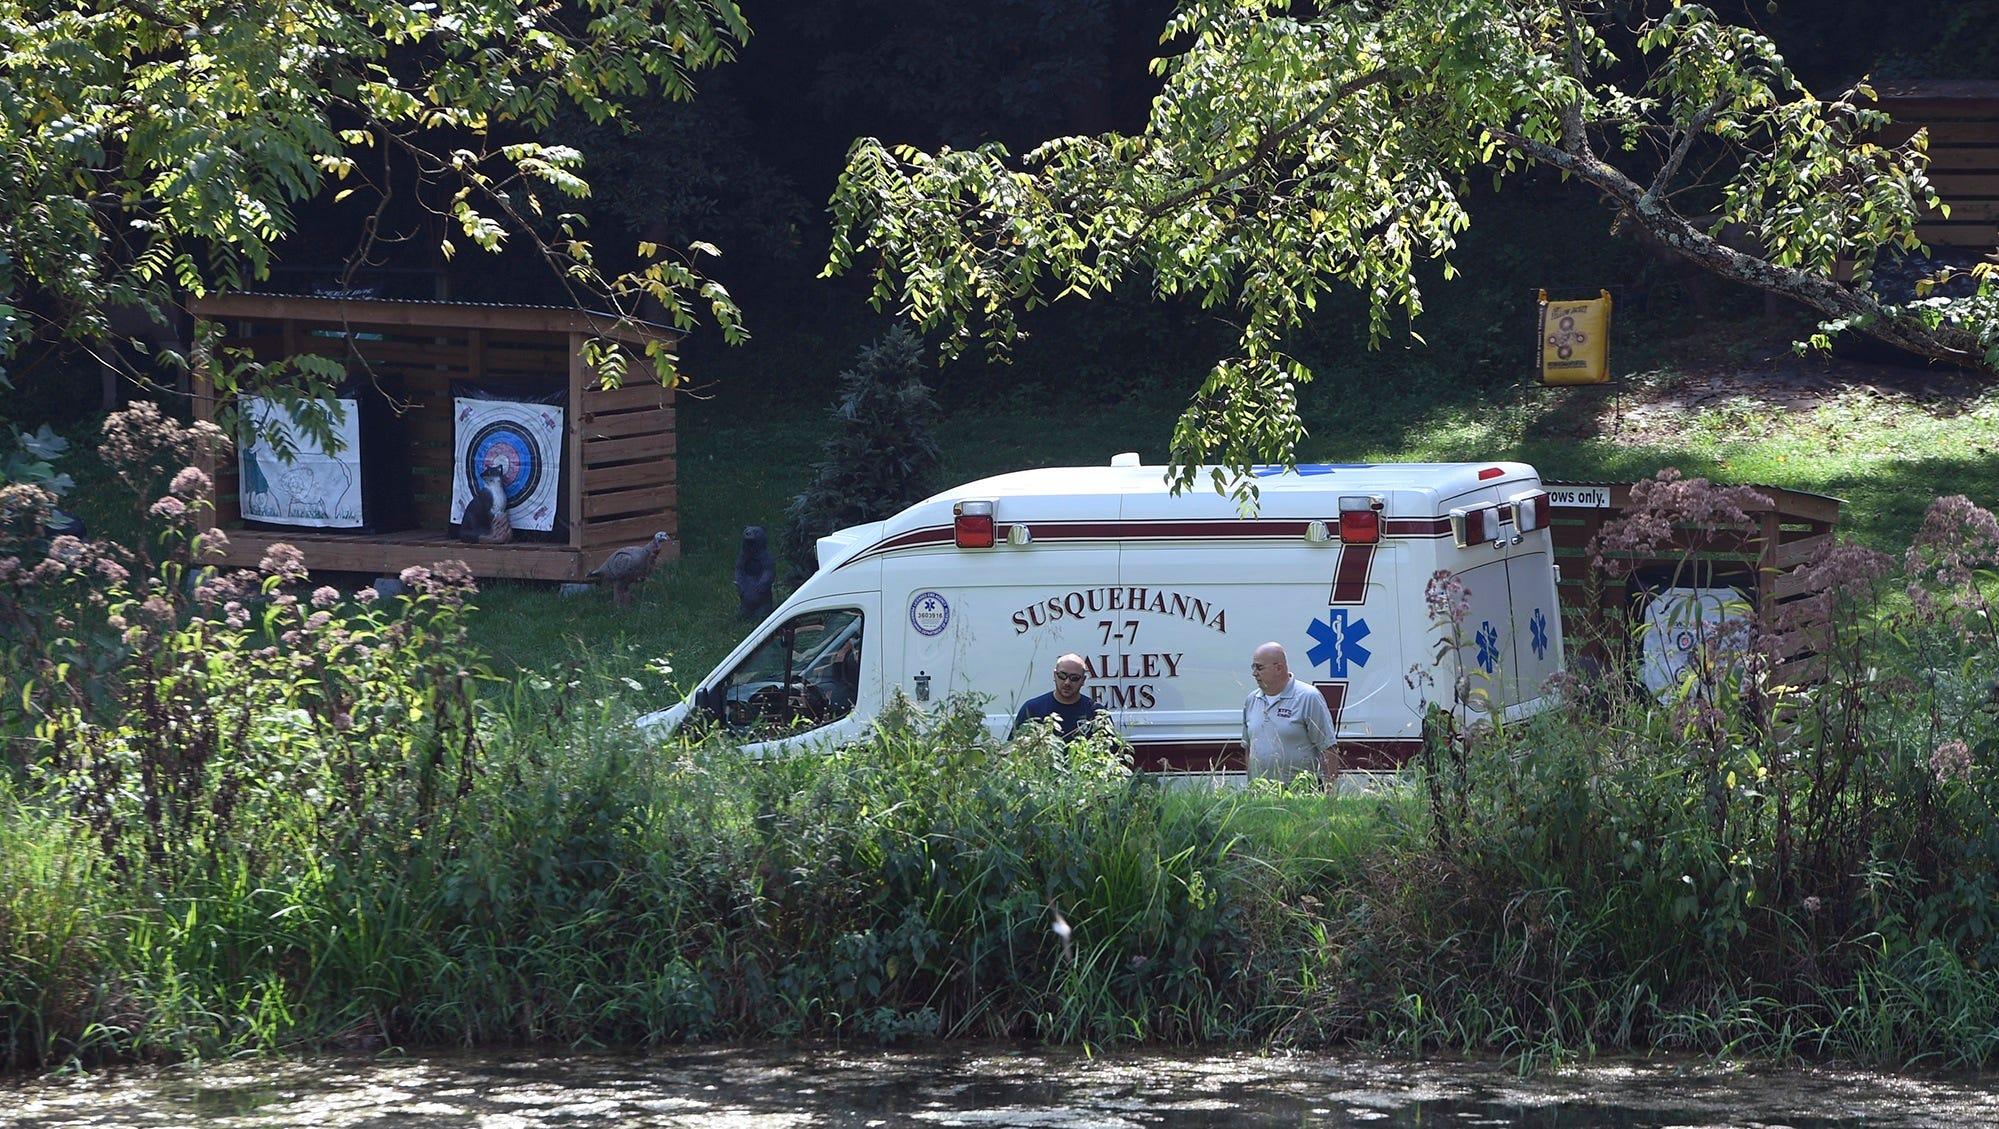 Coroner, police ID body of man found in Codorus Creek last month